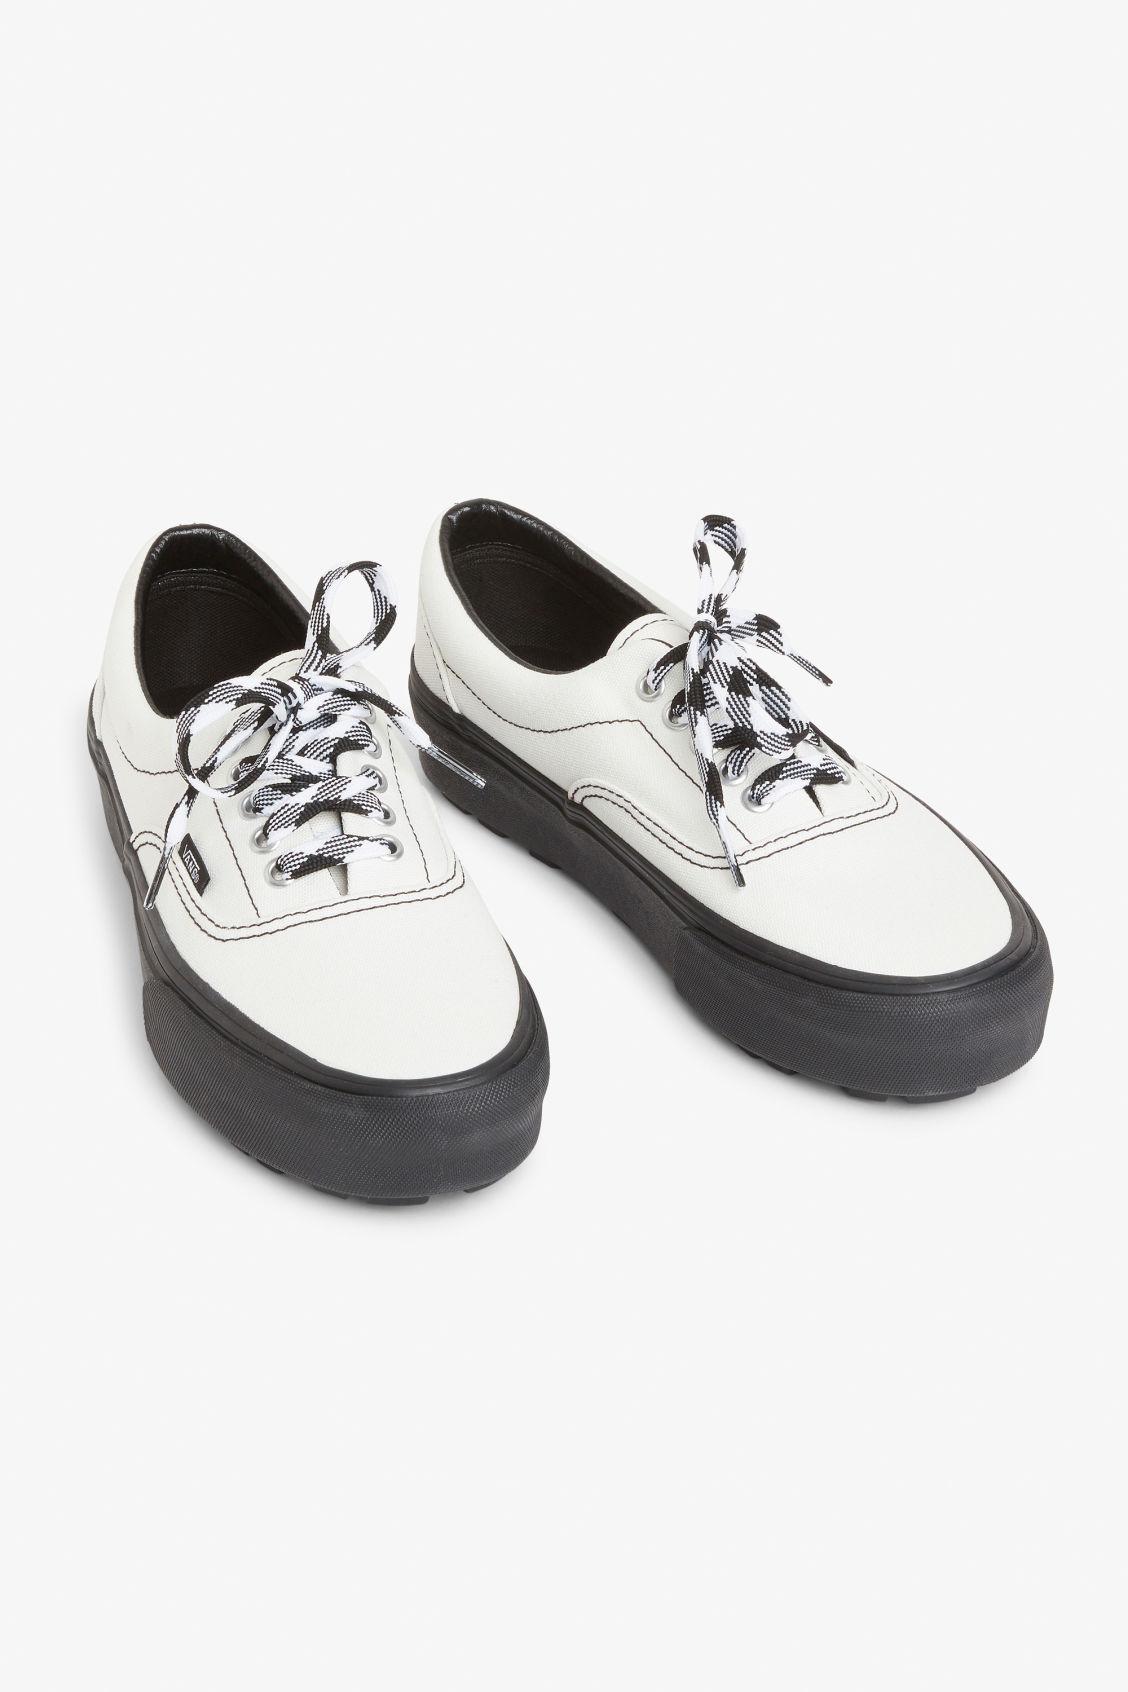 cf3a44ea21aa Vans era 90s platforms - Cloud dancer - Shoes - Monki